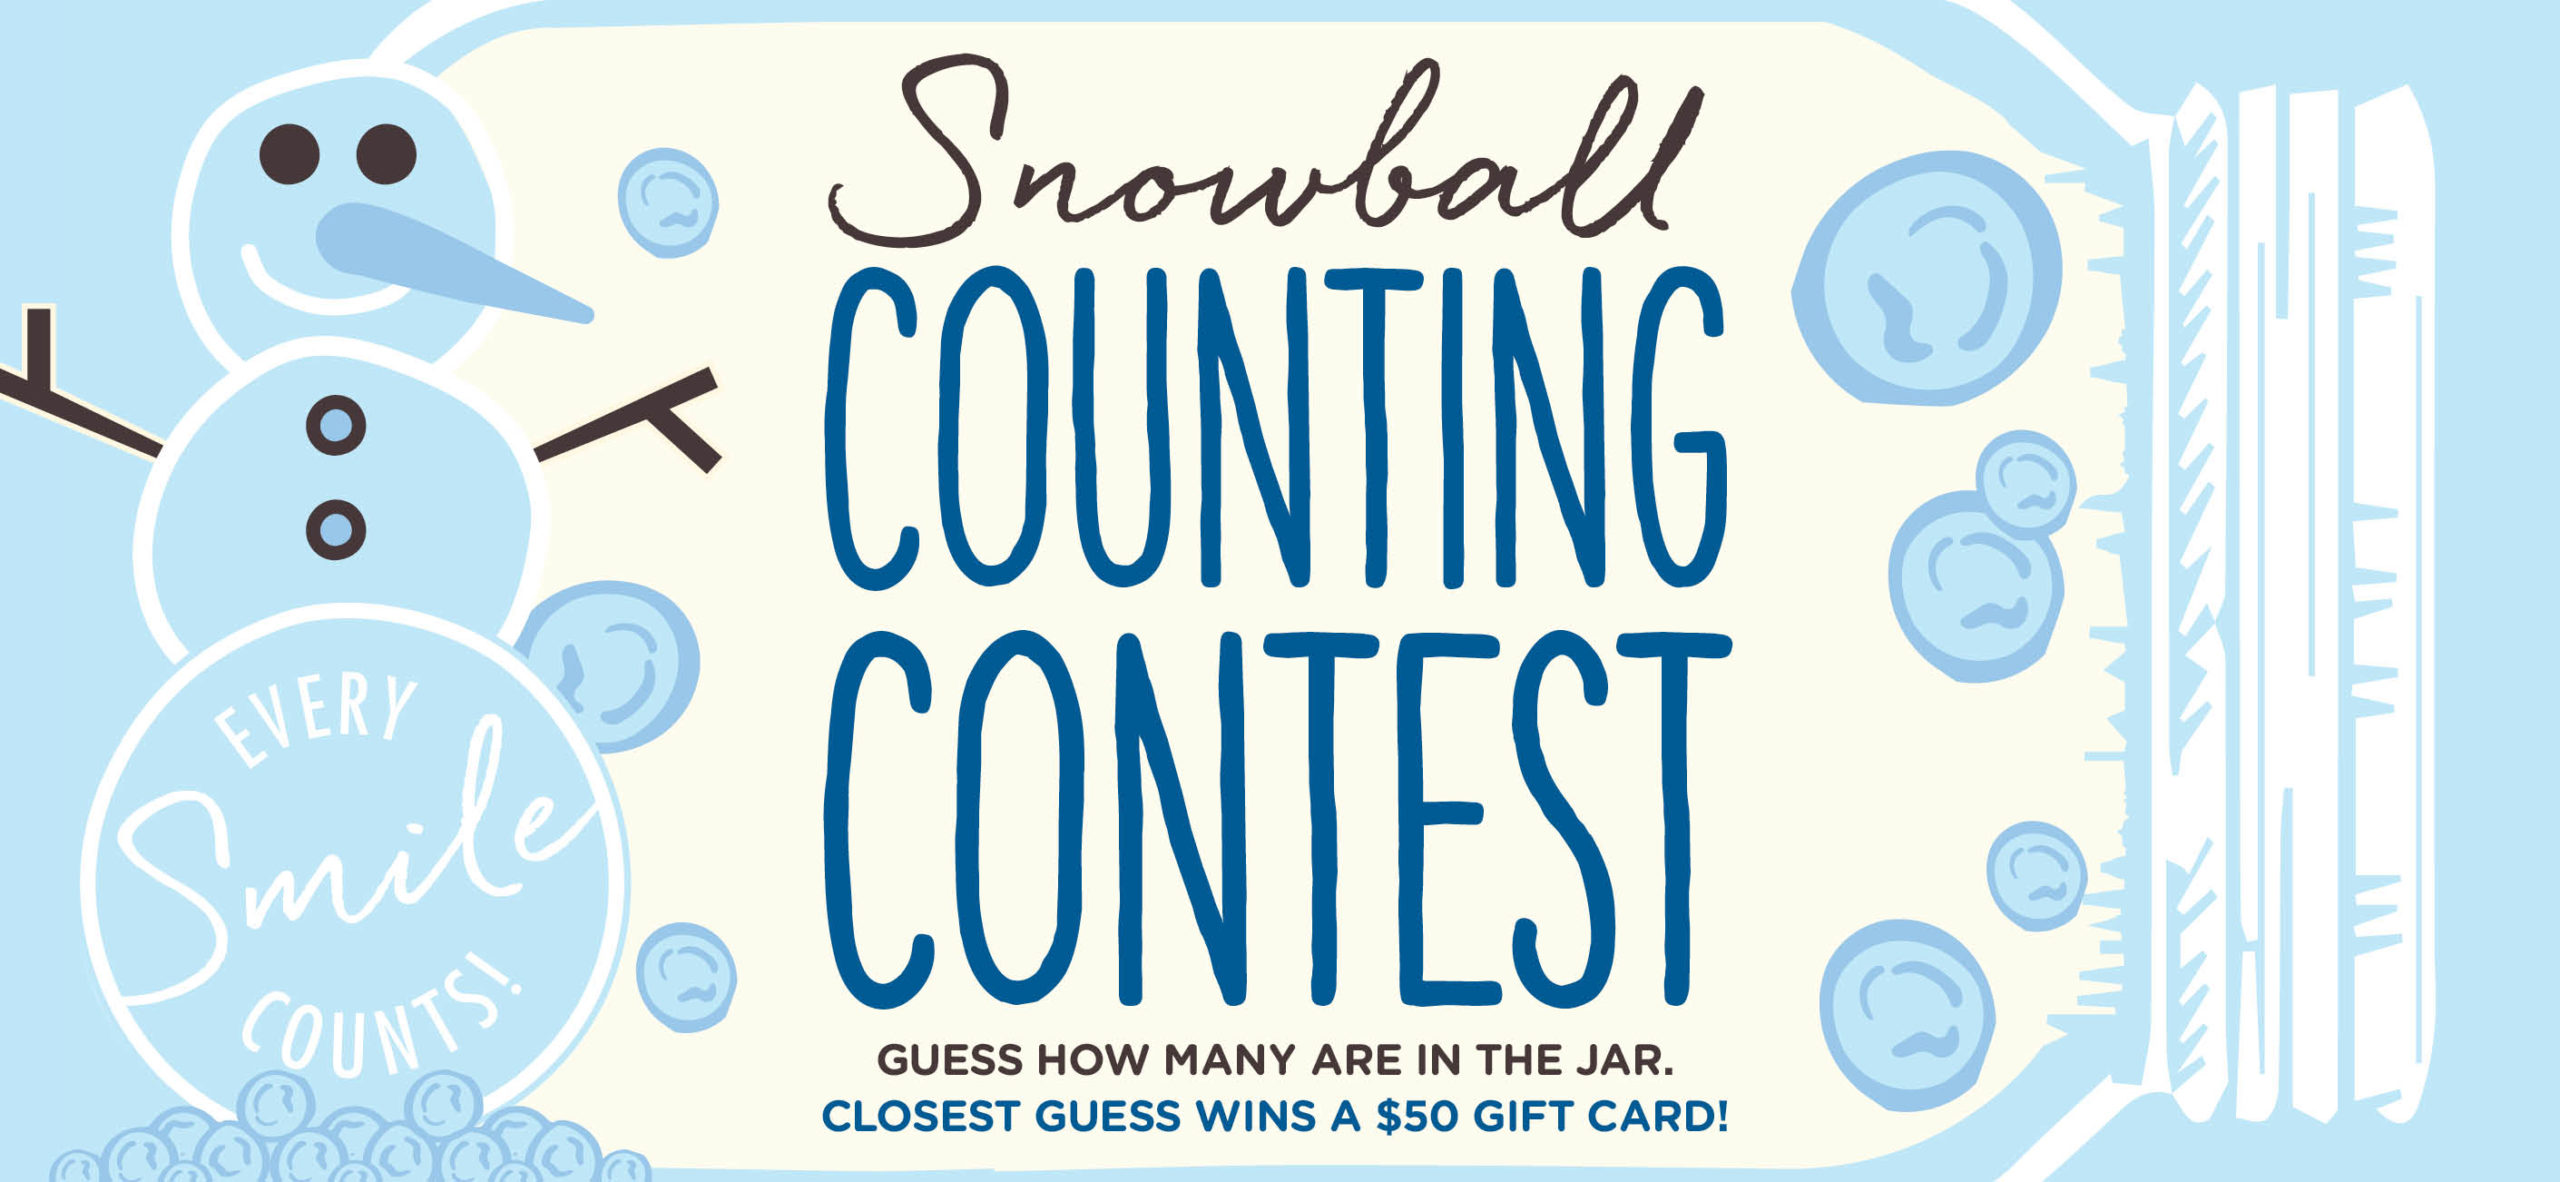 January snowball contest